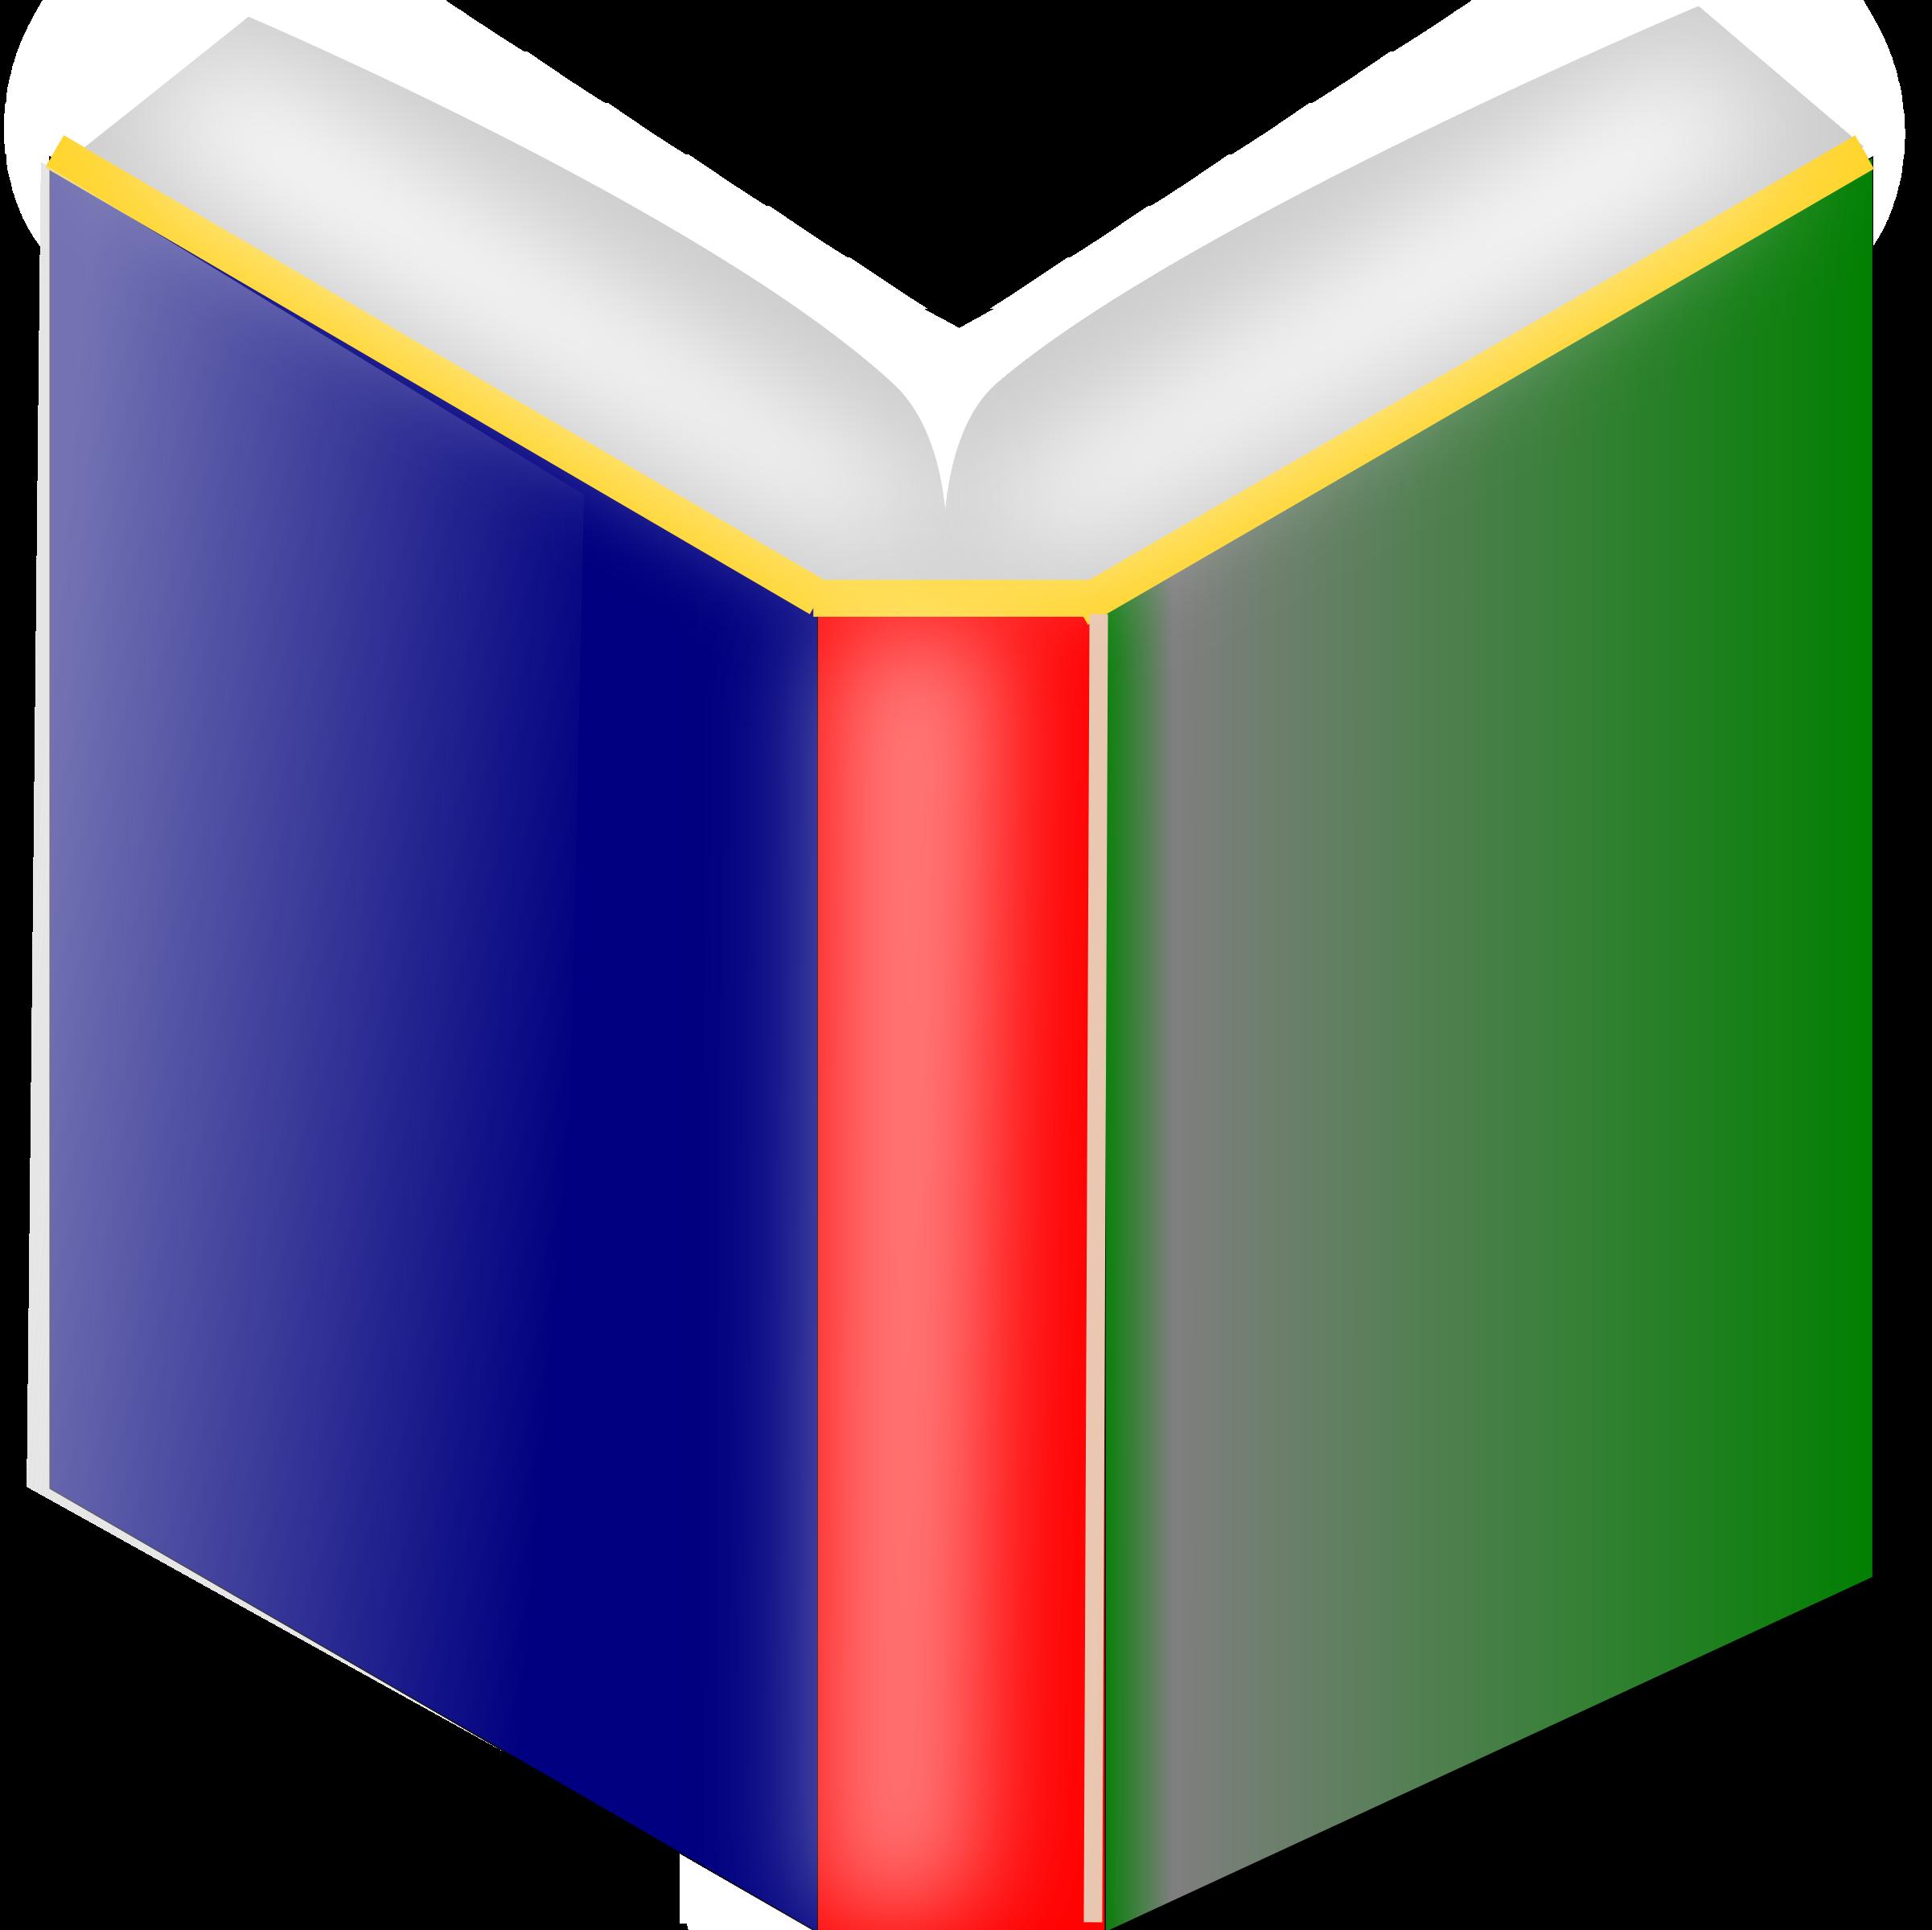 New book clipart jpg transparent download Clipart - Book with New Fade jpg transparent download